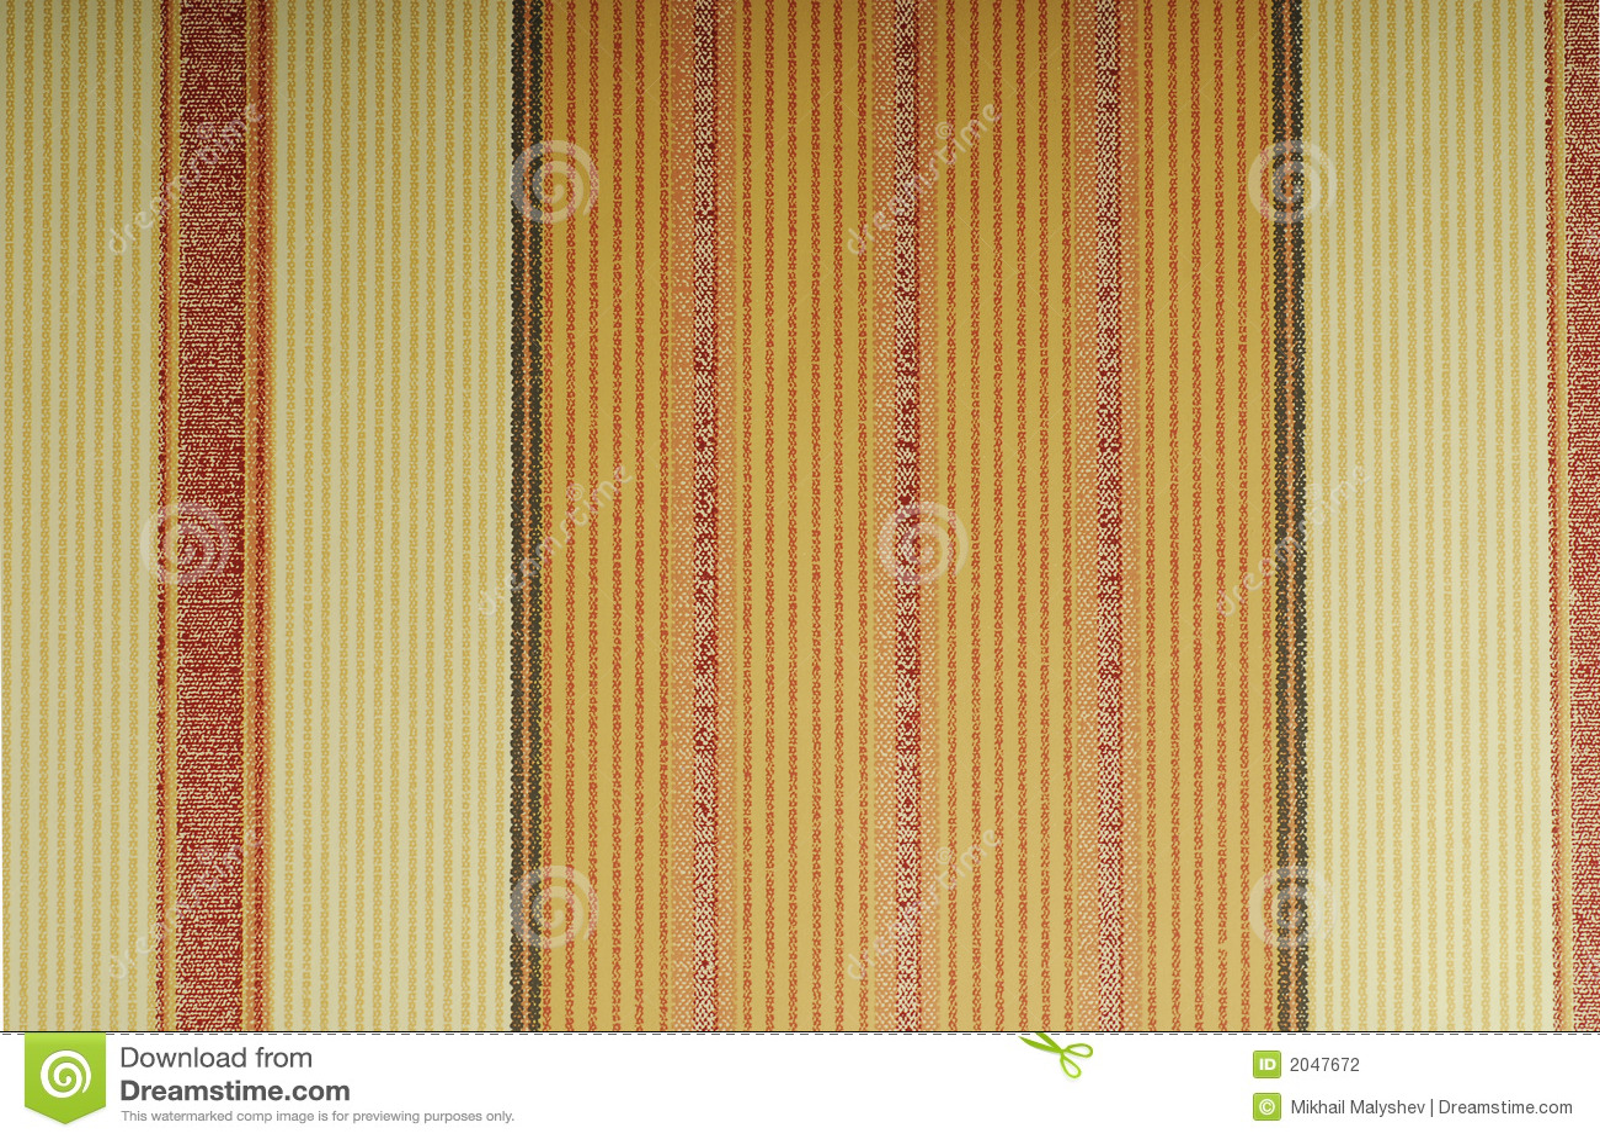 Carta Da Parati A Righe Beige : Carta da parati arancione con le righe verticali illustrazione di